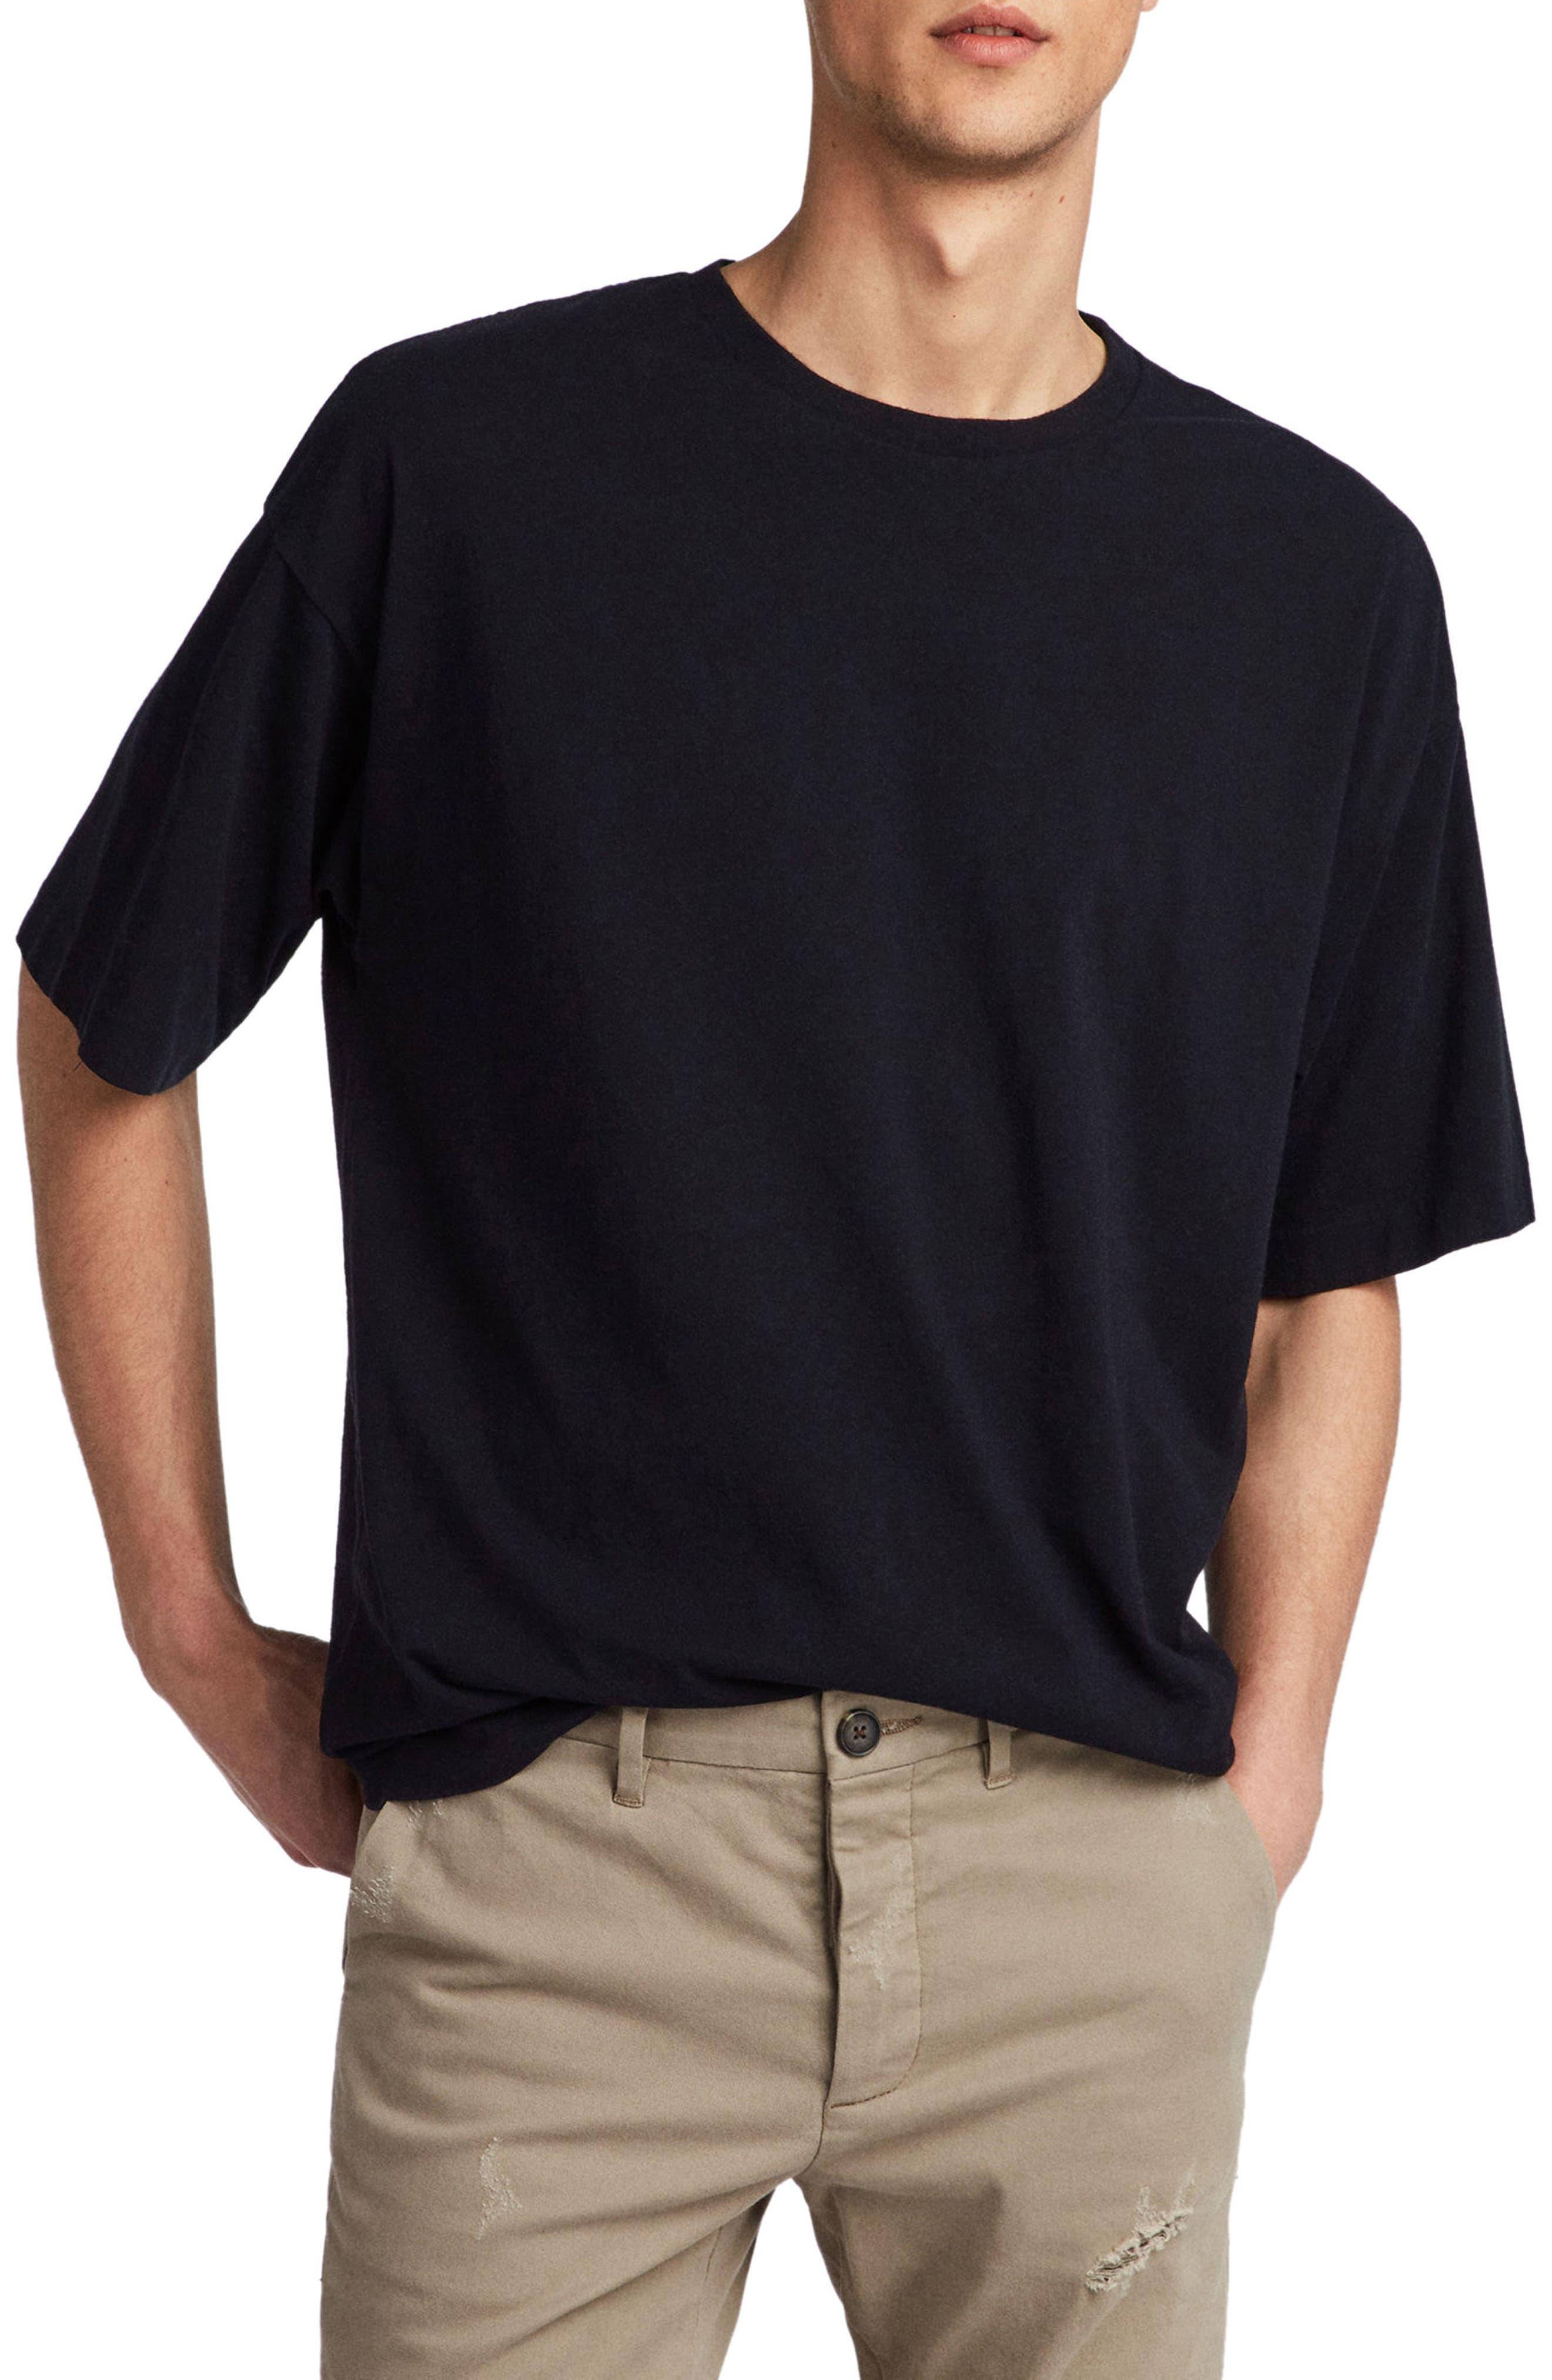 Atnom Crewneck T-Shirt,                             Main thumbnail 1, color,                             JET BLACK